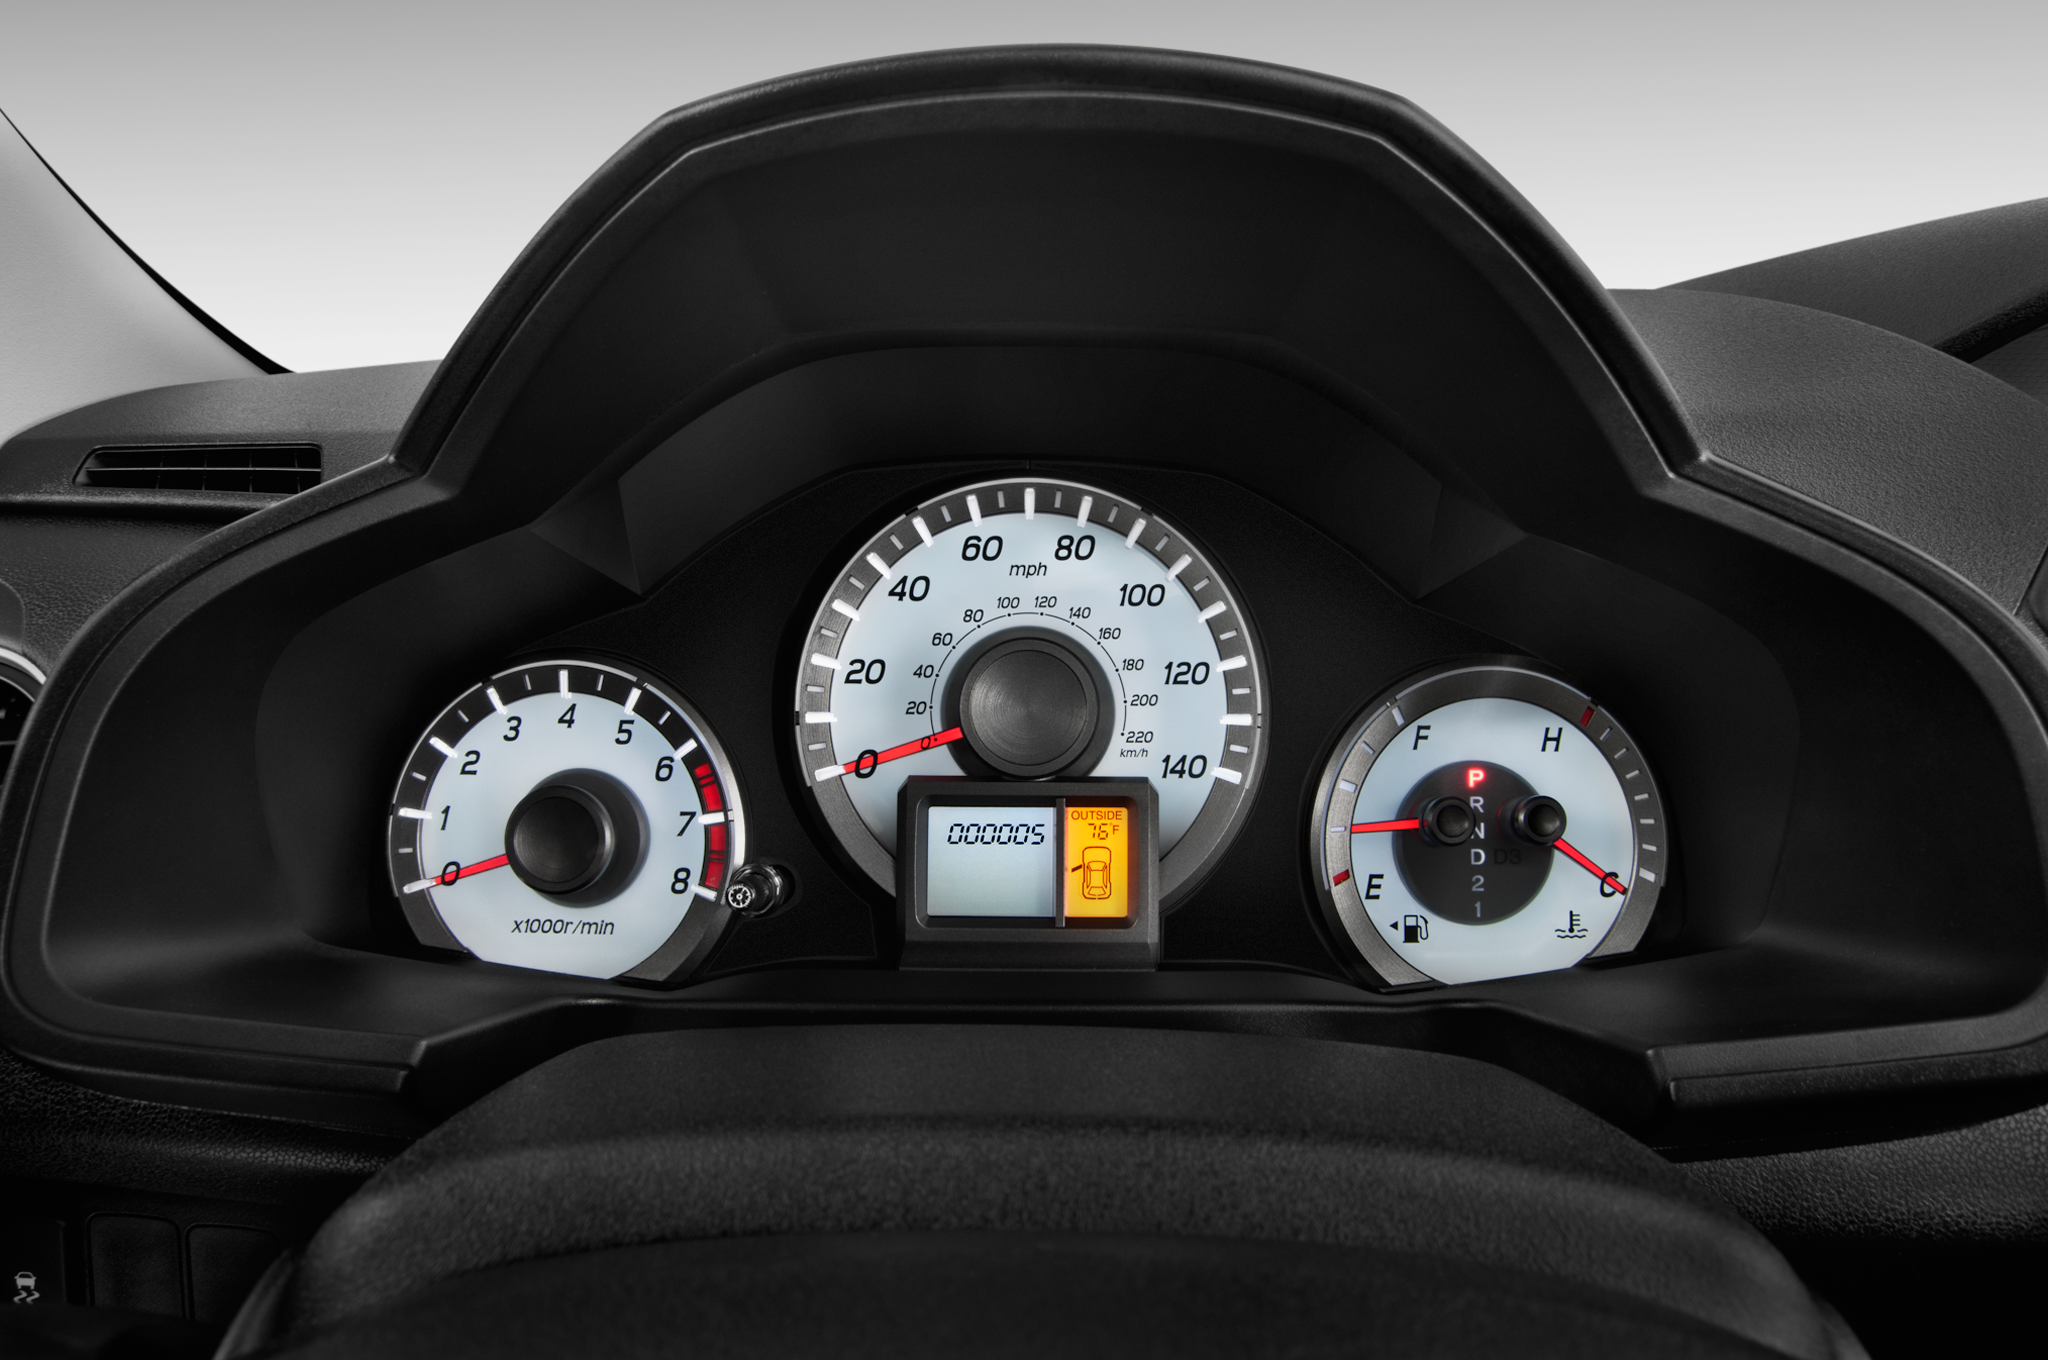 2012 Honda Pilot 4wd Touring Editors Notebook